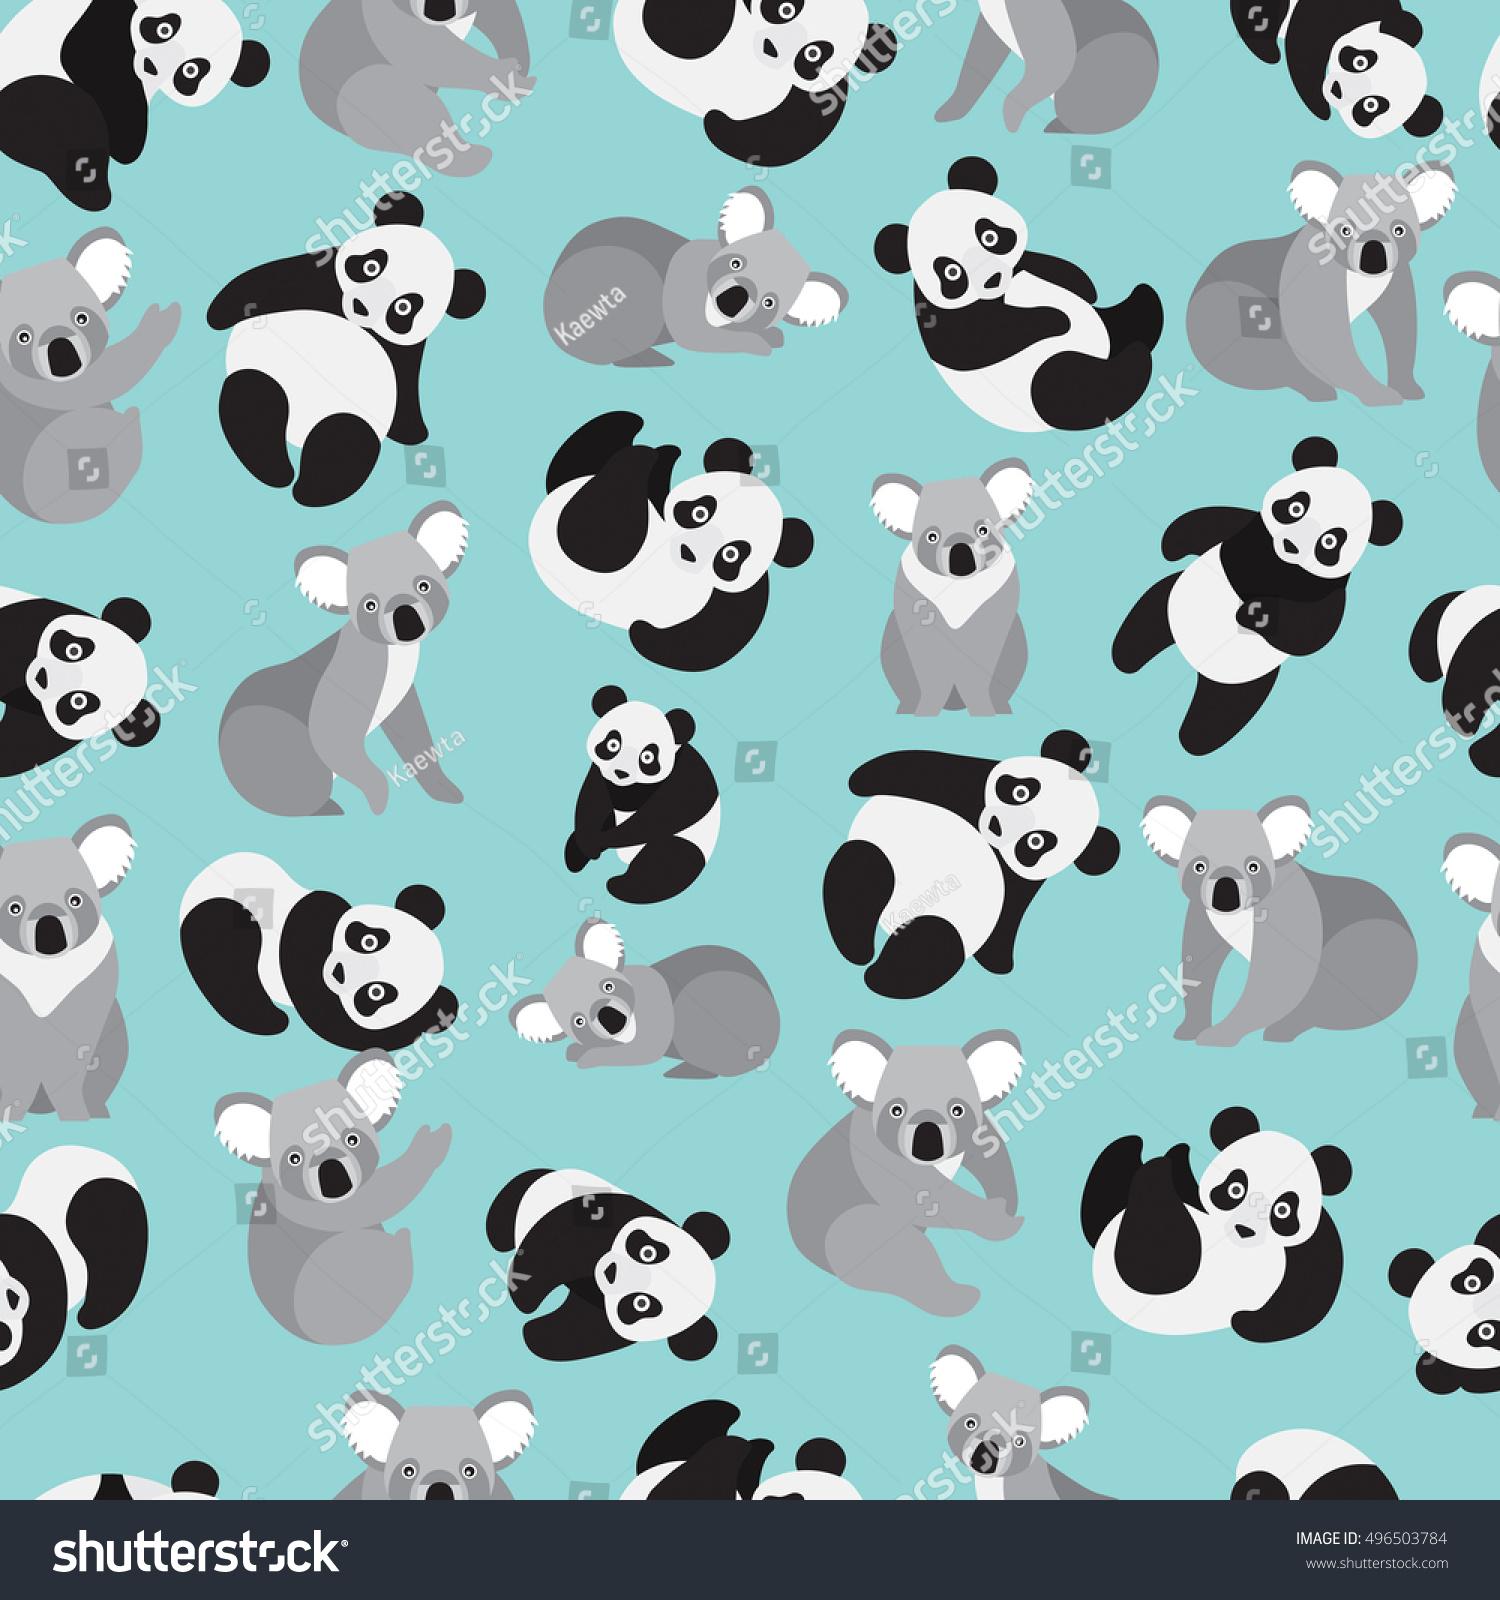 Good Wallpaper Koala Cartoon - stock-vector-cute-panda-and-koala-on-green-background-pattern-animal-seamless-pattern-design-496503784  Gallery_30516   .jpg